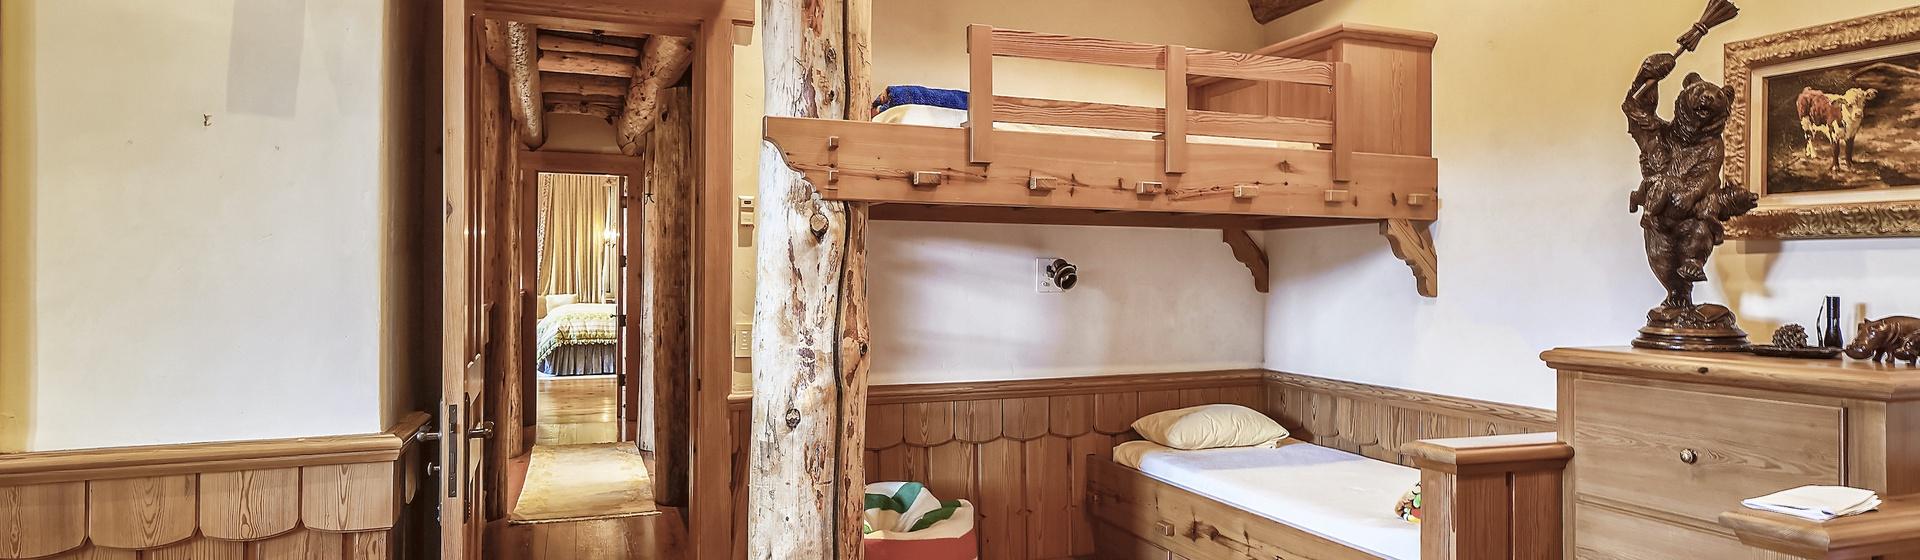 9.5-Telluride-Sleeping-Indian-Ranch-Swiss-Suite-Bunk-BedroomH-web.JPG